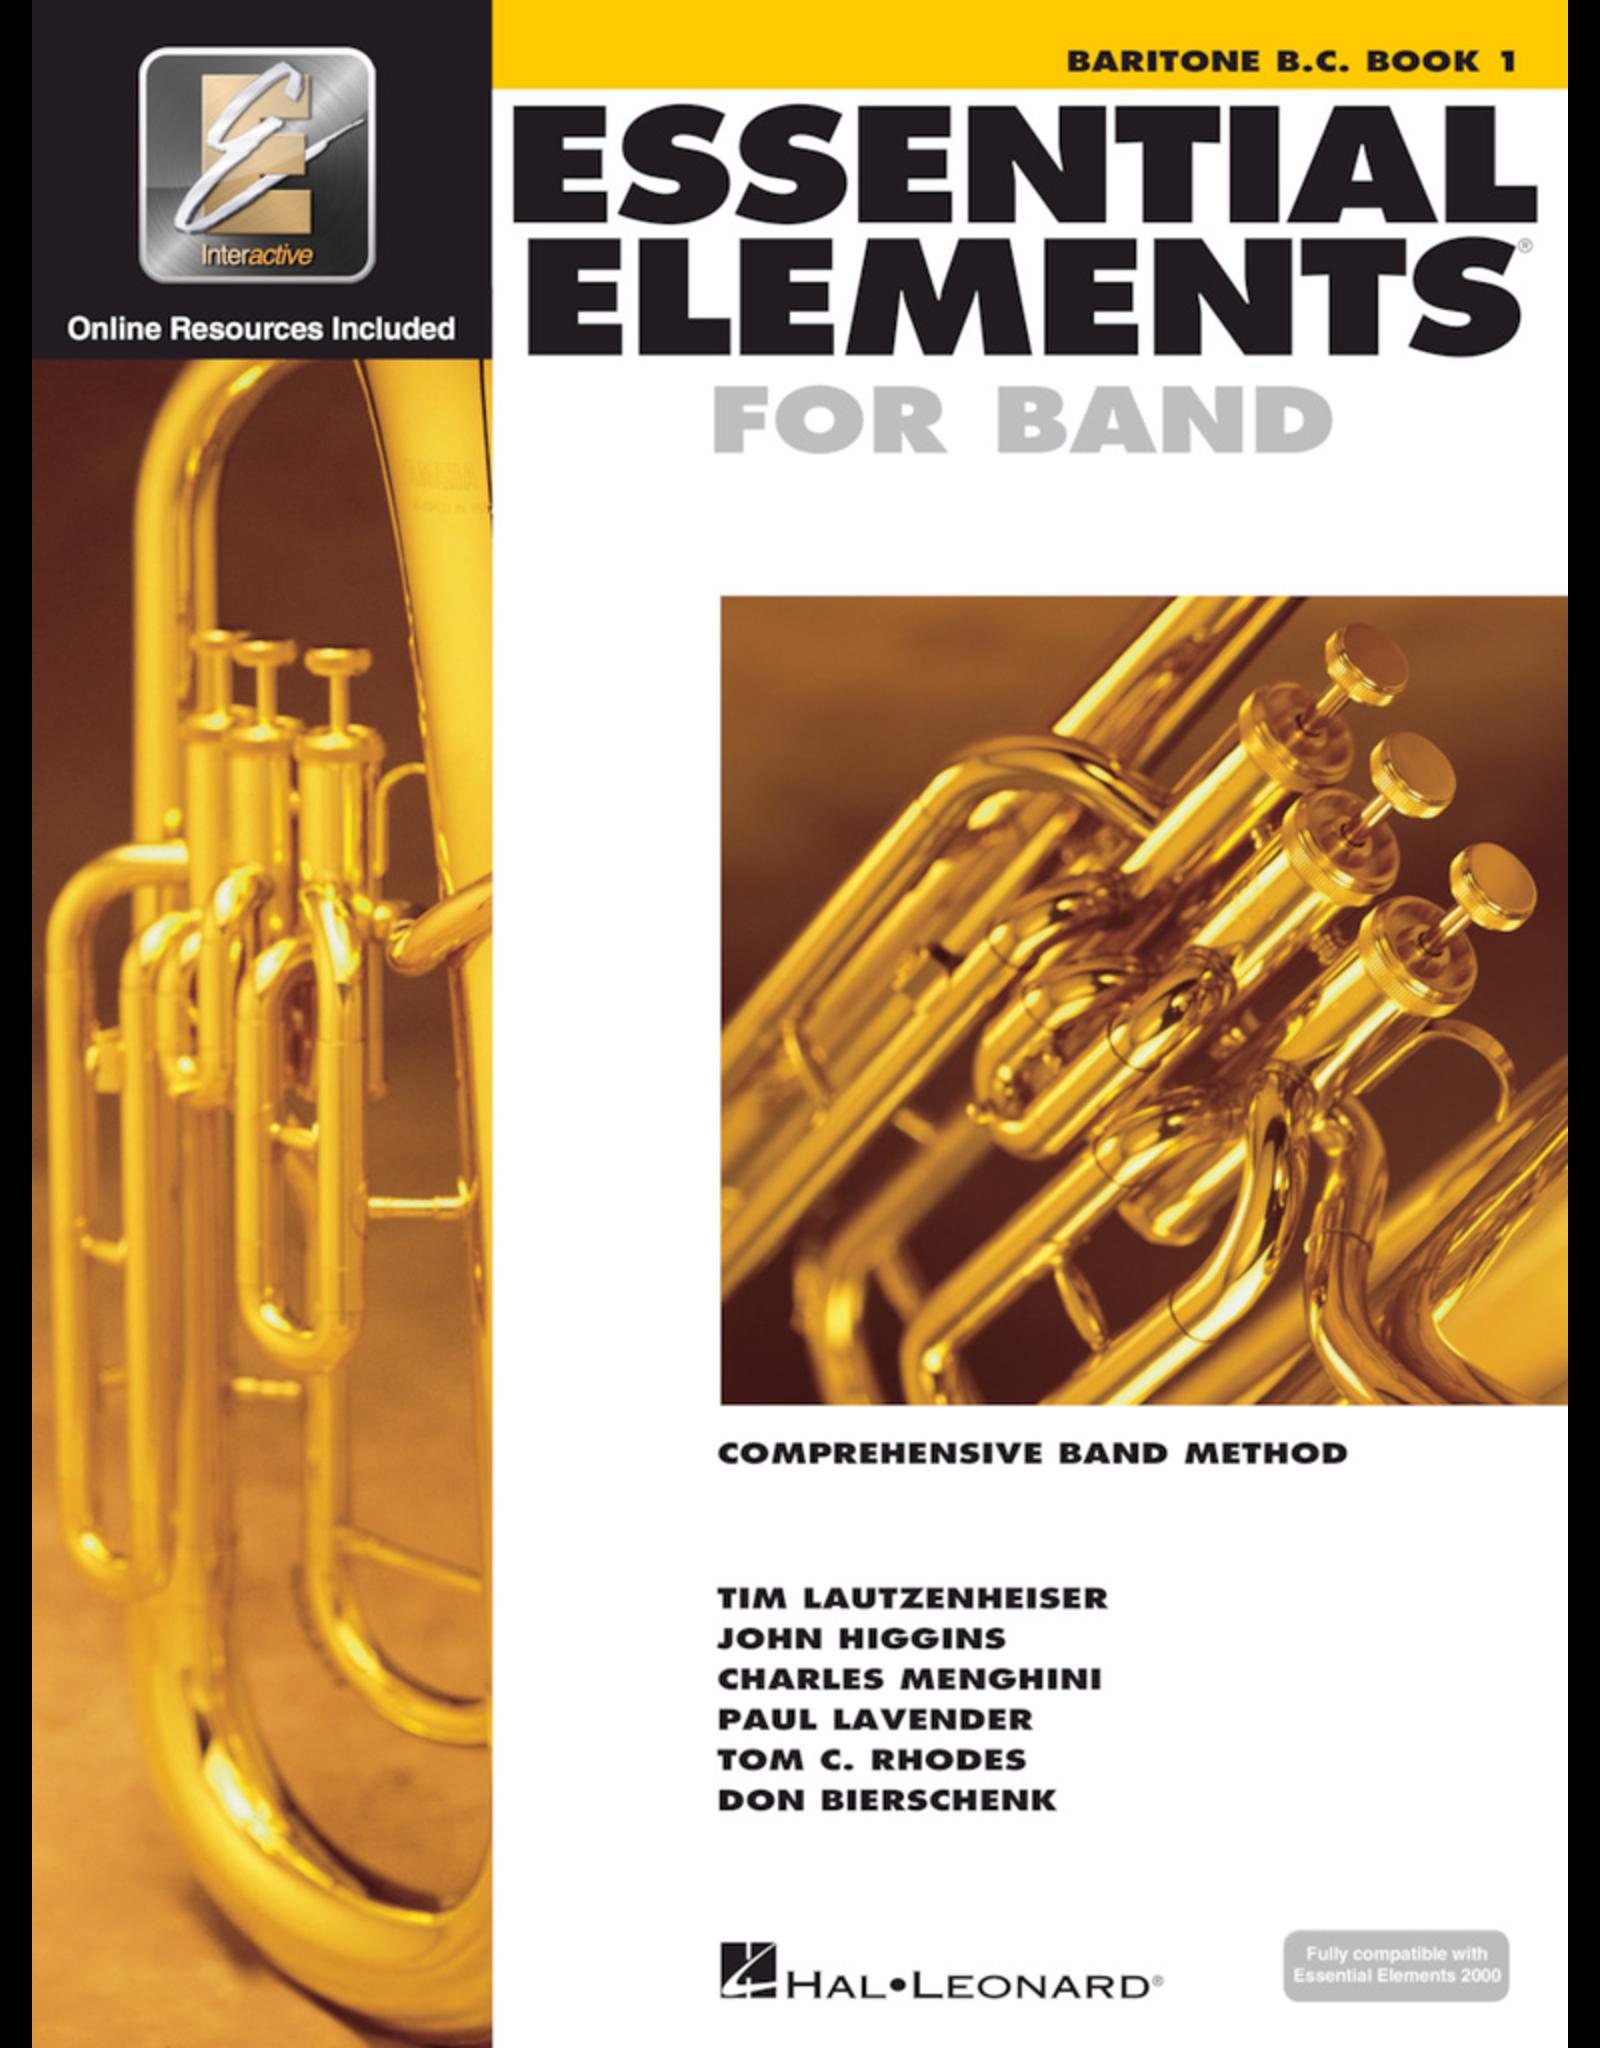 Hal Leonard Essential Elements Book 1 Baritone B.C.